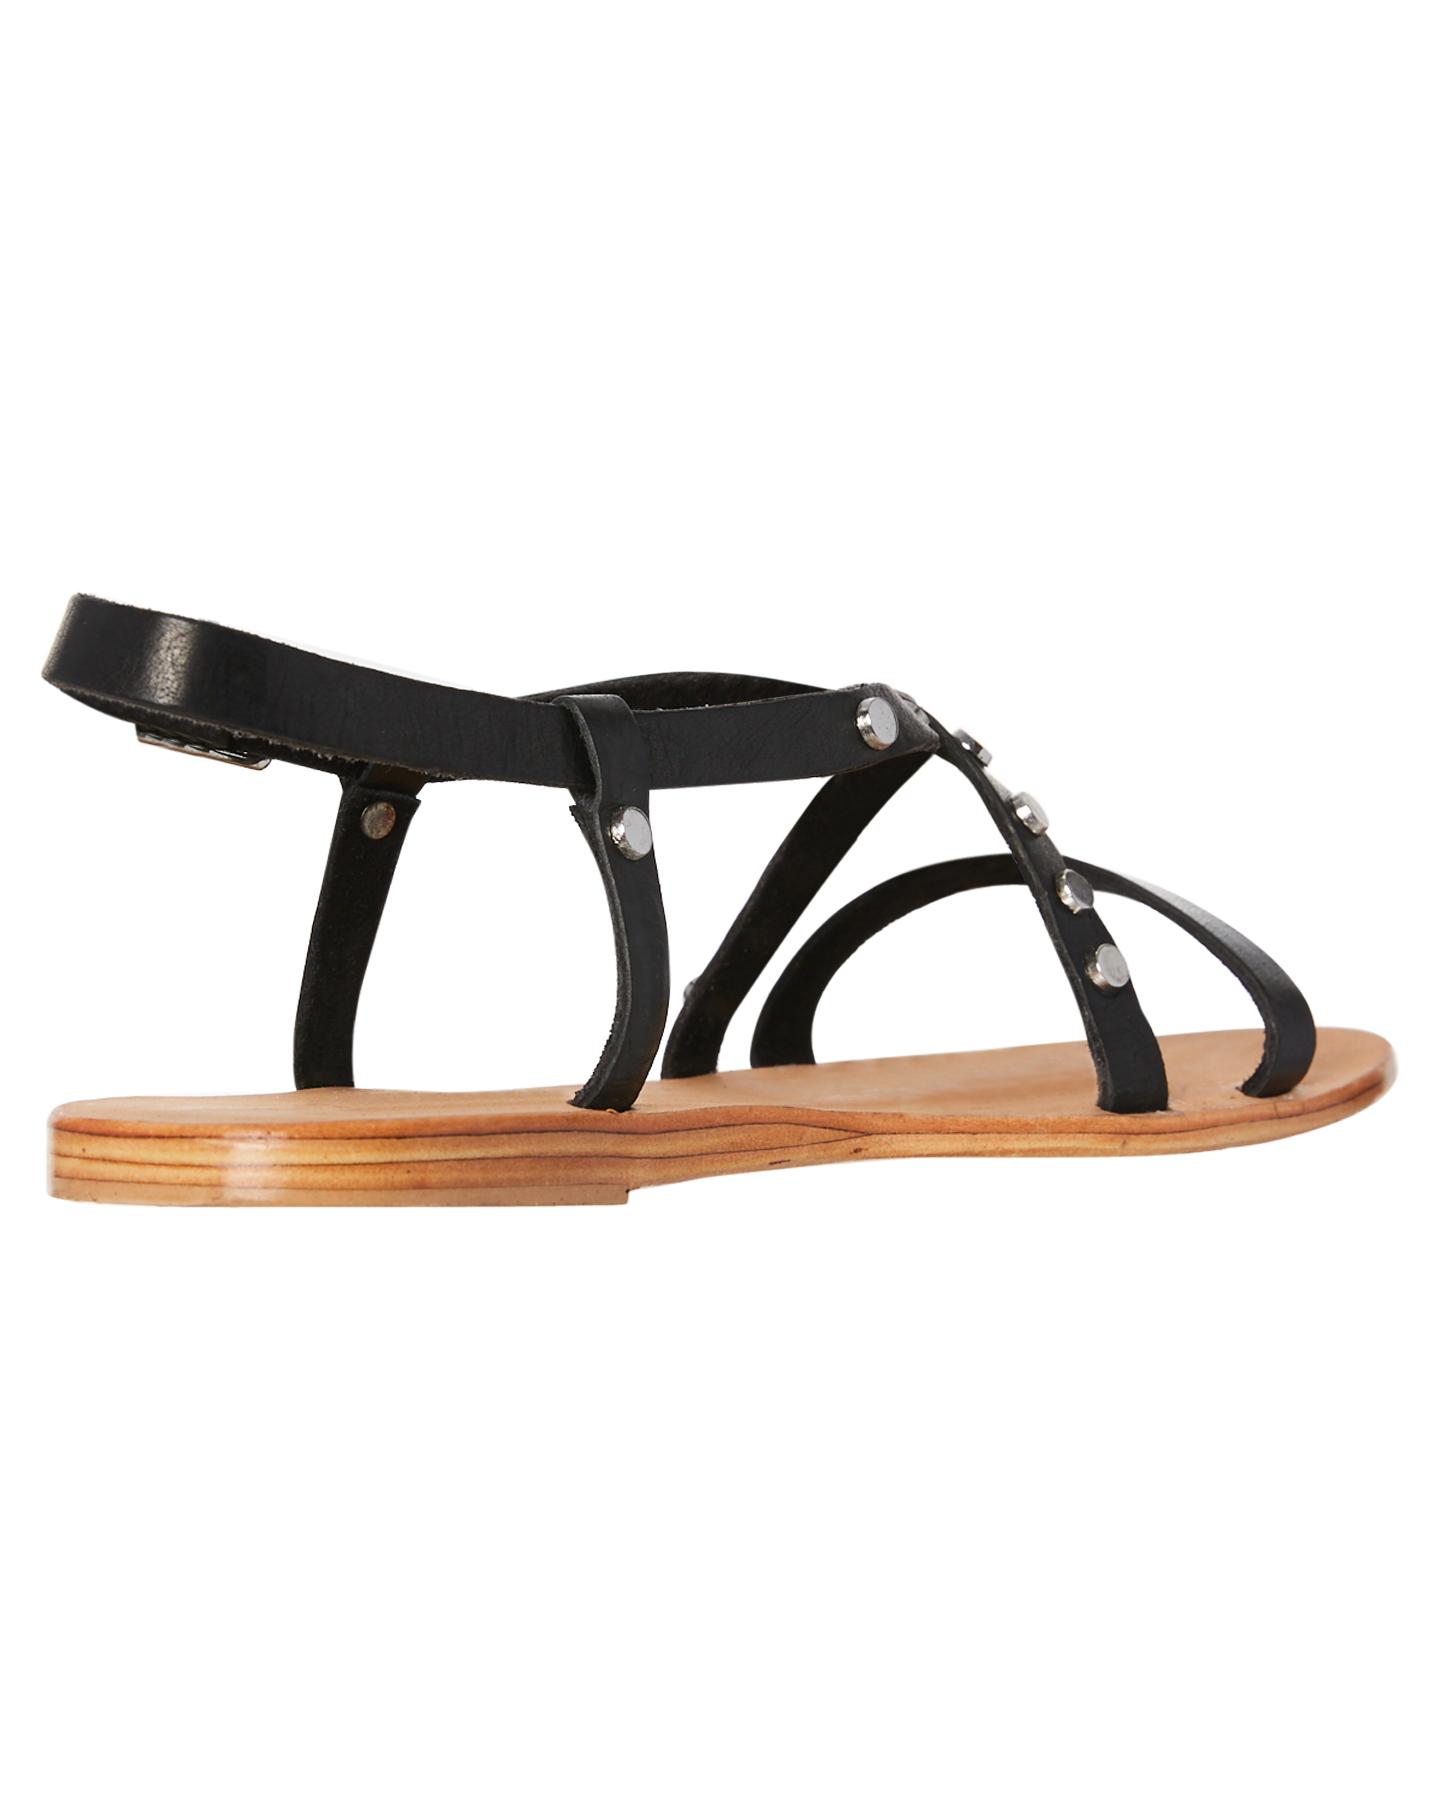 New Urge Women's Women's Women's Sailor Leather Sandal Natural 523be4